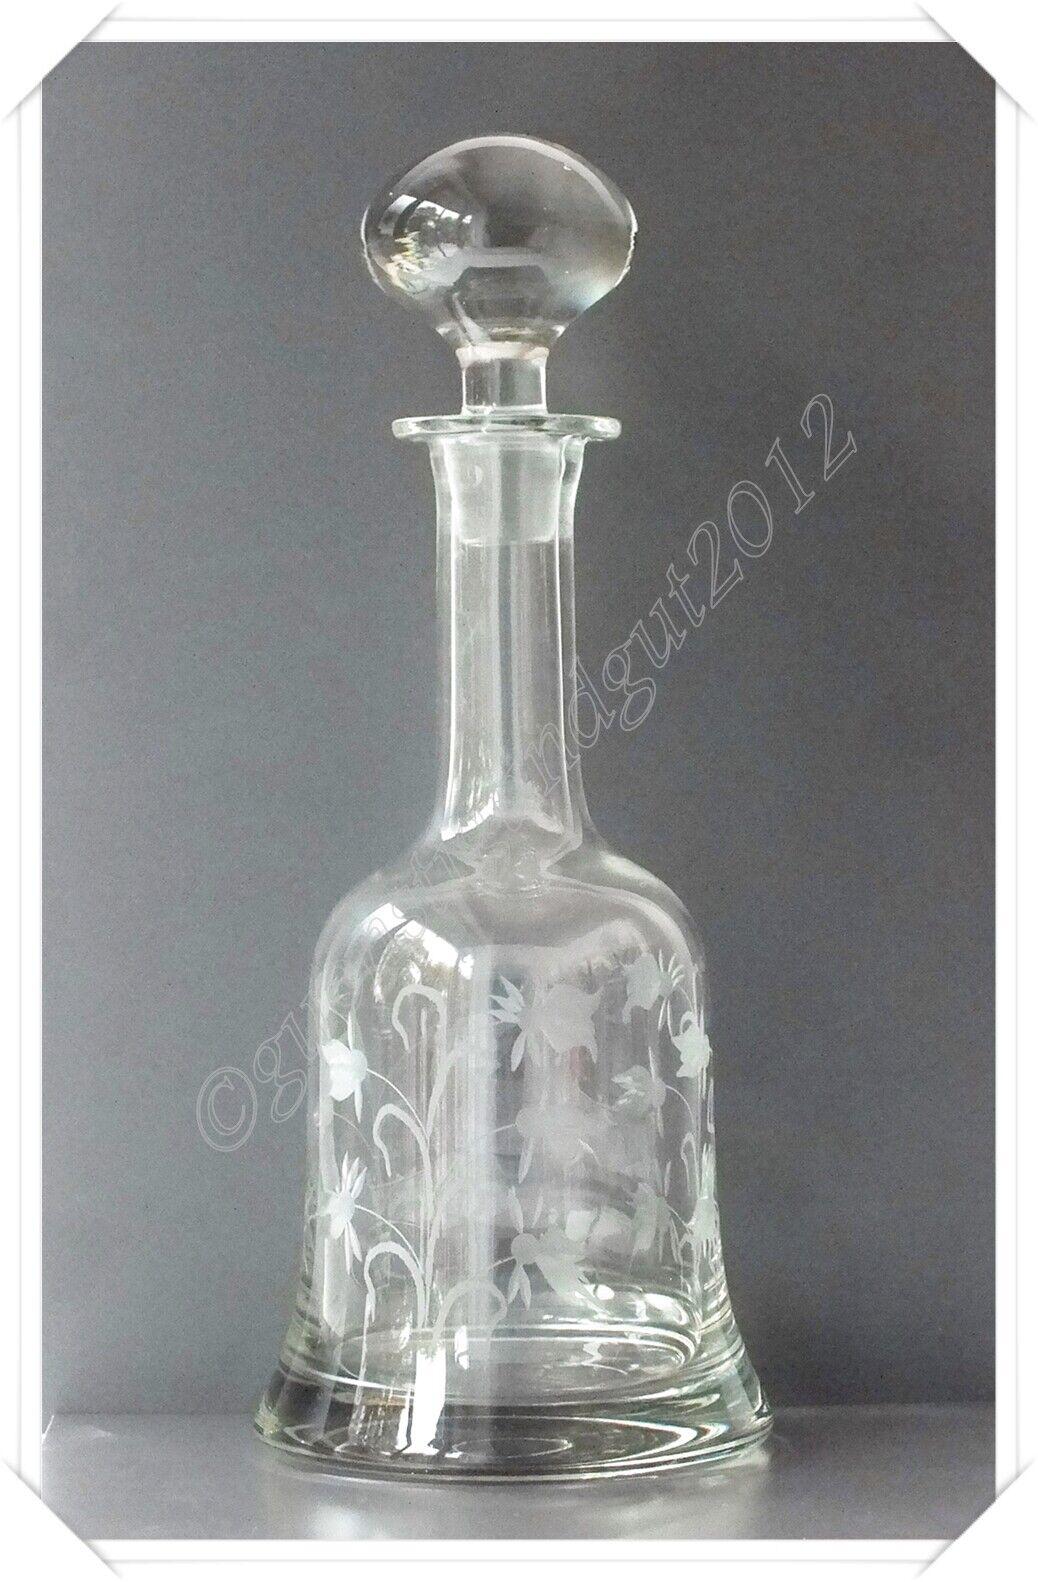 EDEL - Glas Karaffe mit Stöpsel Whisky Cognac Brandy Sherry Likör Tiefen Schliff